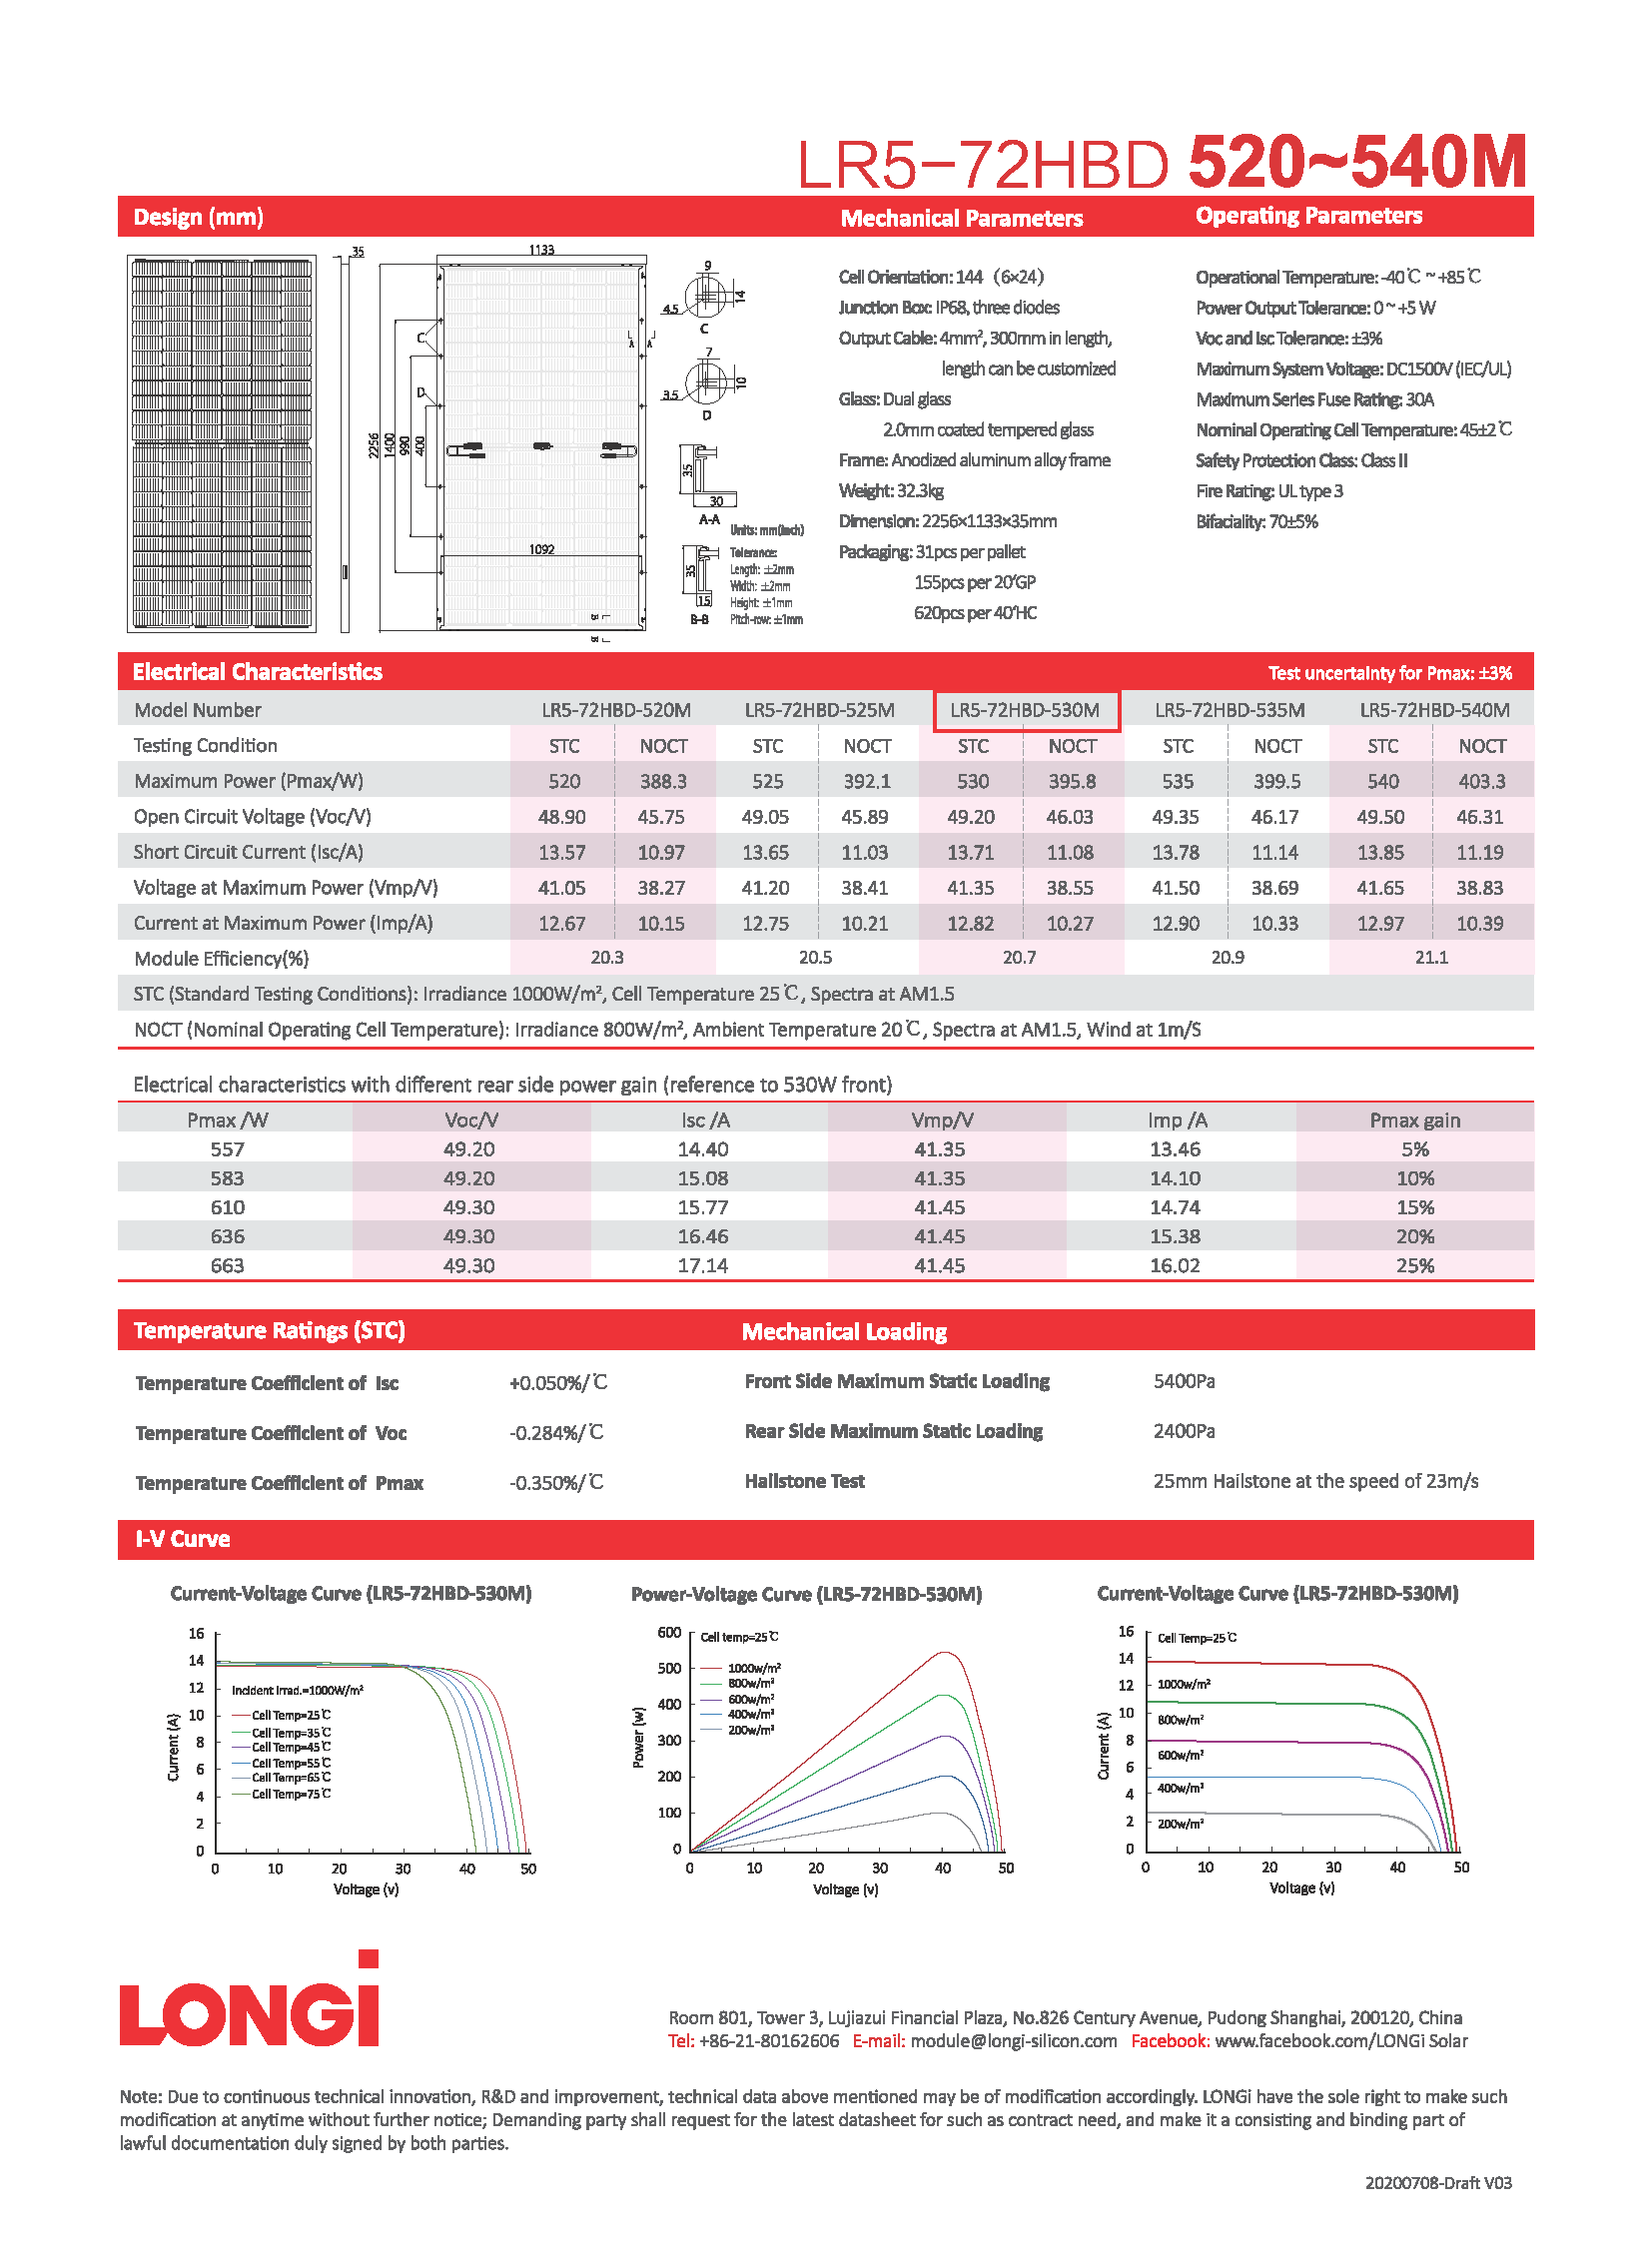 http://solarcellcenter.com/img/cms/LONGi Solar Mono PV/LONGi Solar-LR5-72HBD 530M Data Sheet_Page_2.png